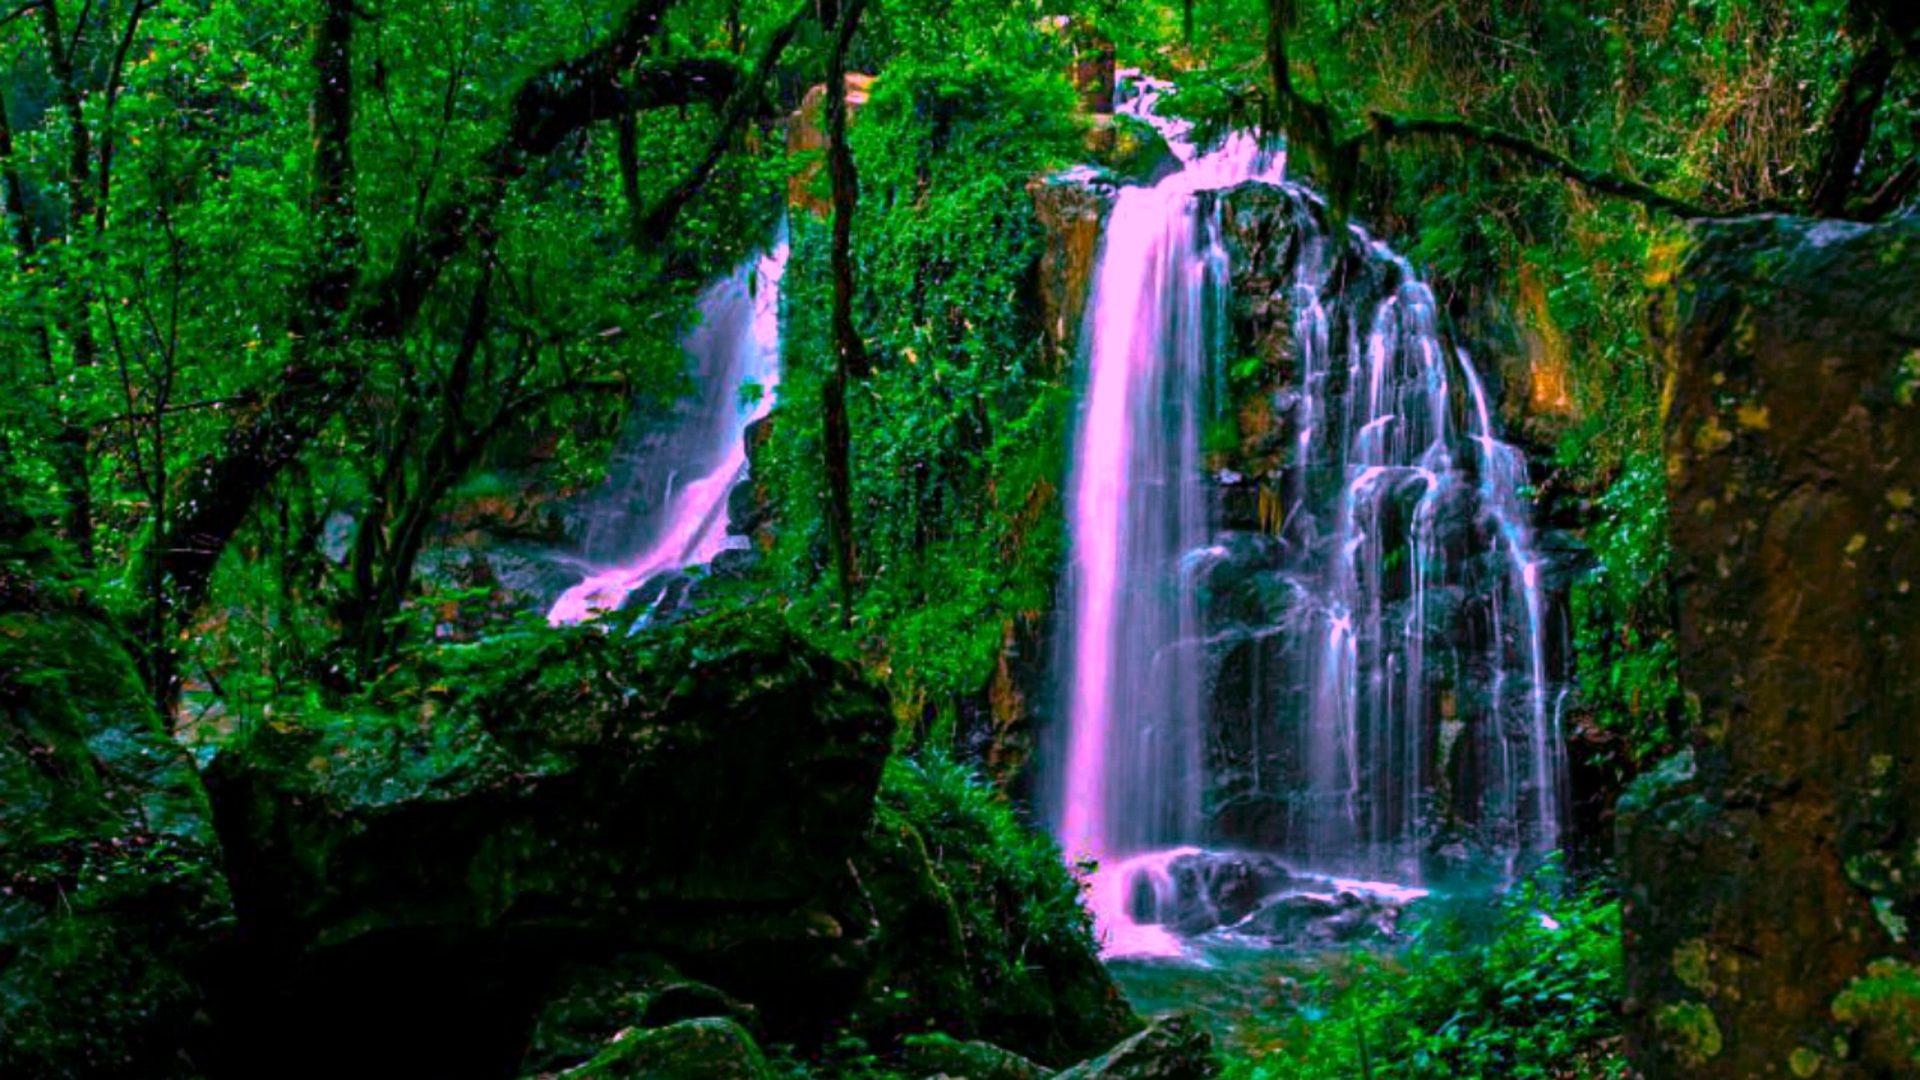 Niagara Falls At Night Wallpaper Magical Forest Waterfall Wide Wallpaper 552228